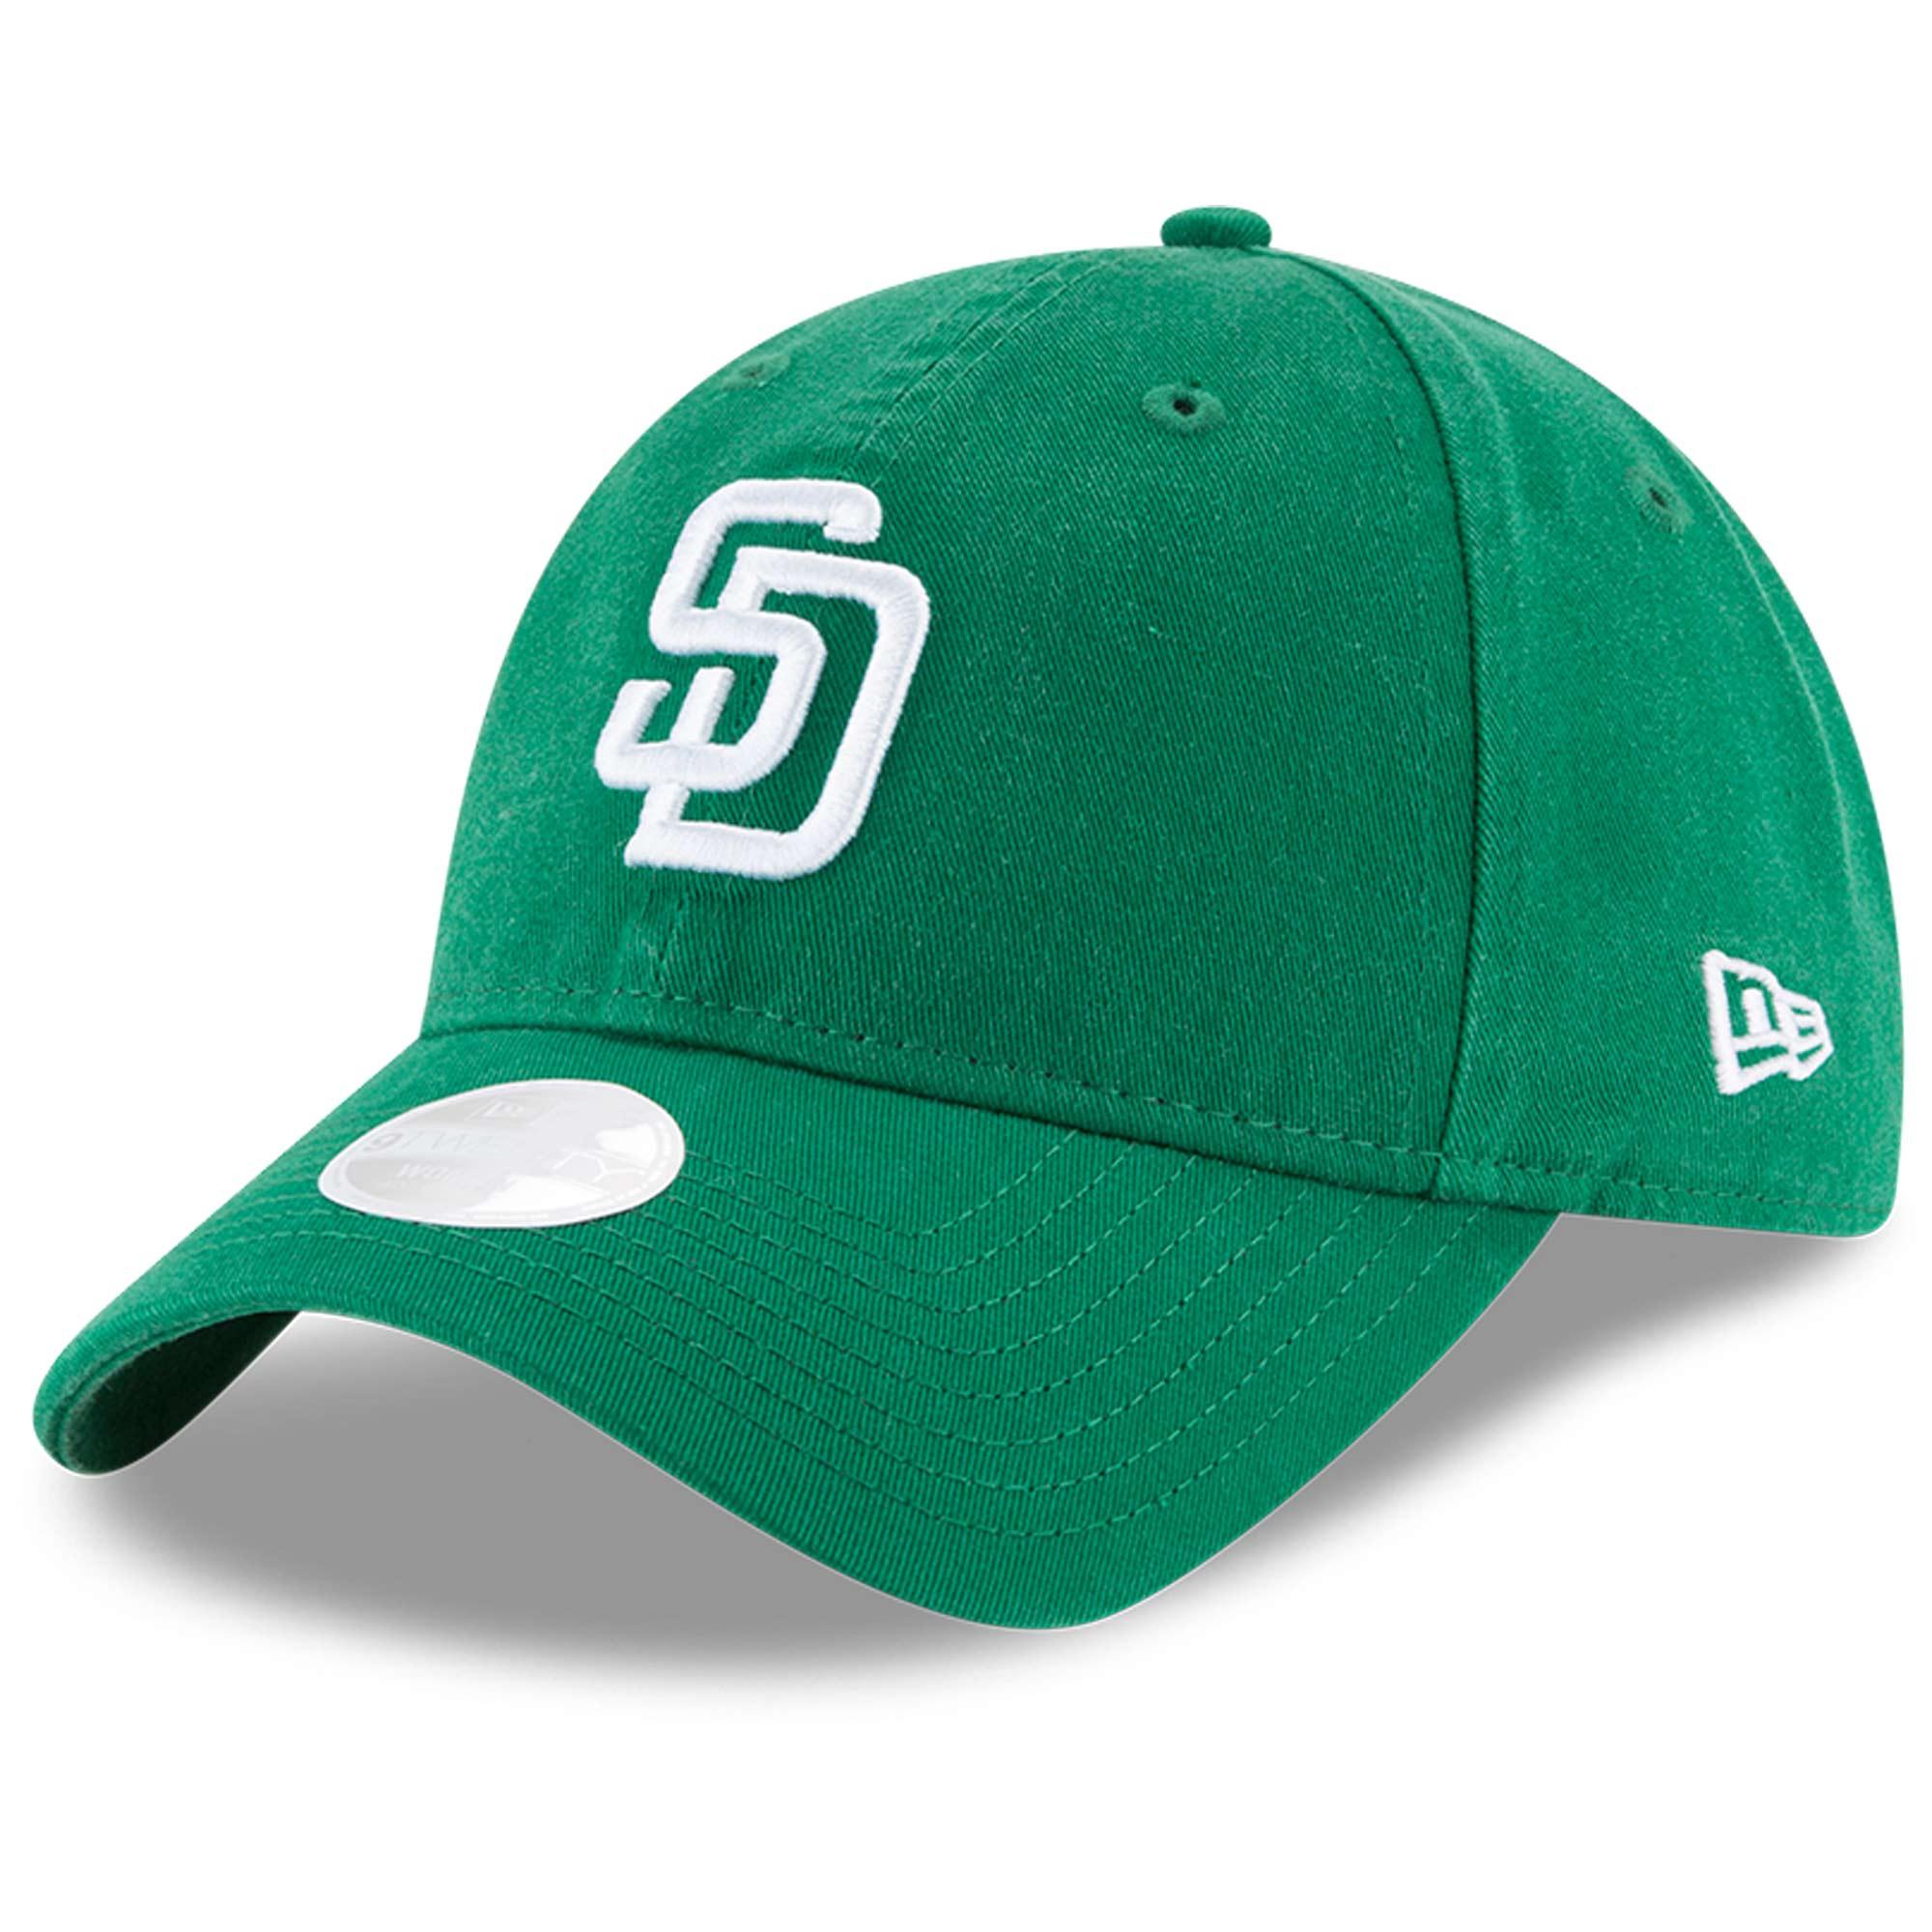 San Diego Padres New Era Women's Core Classic Twill St. Patrick's Day 9TWENTY Adjustable Hat - Green - OSFA